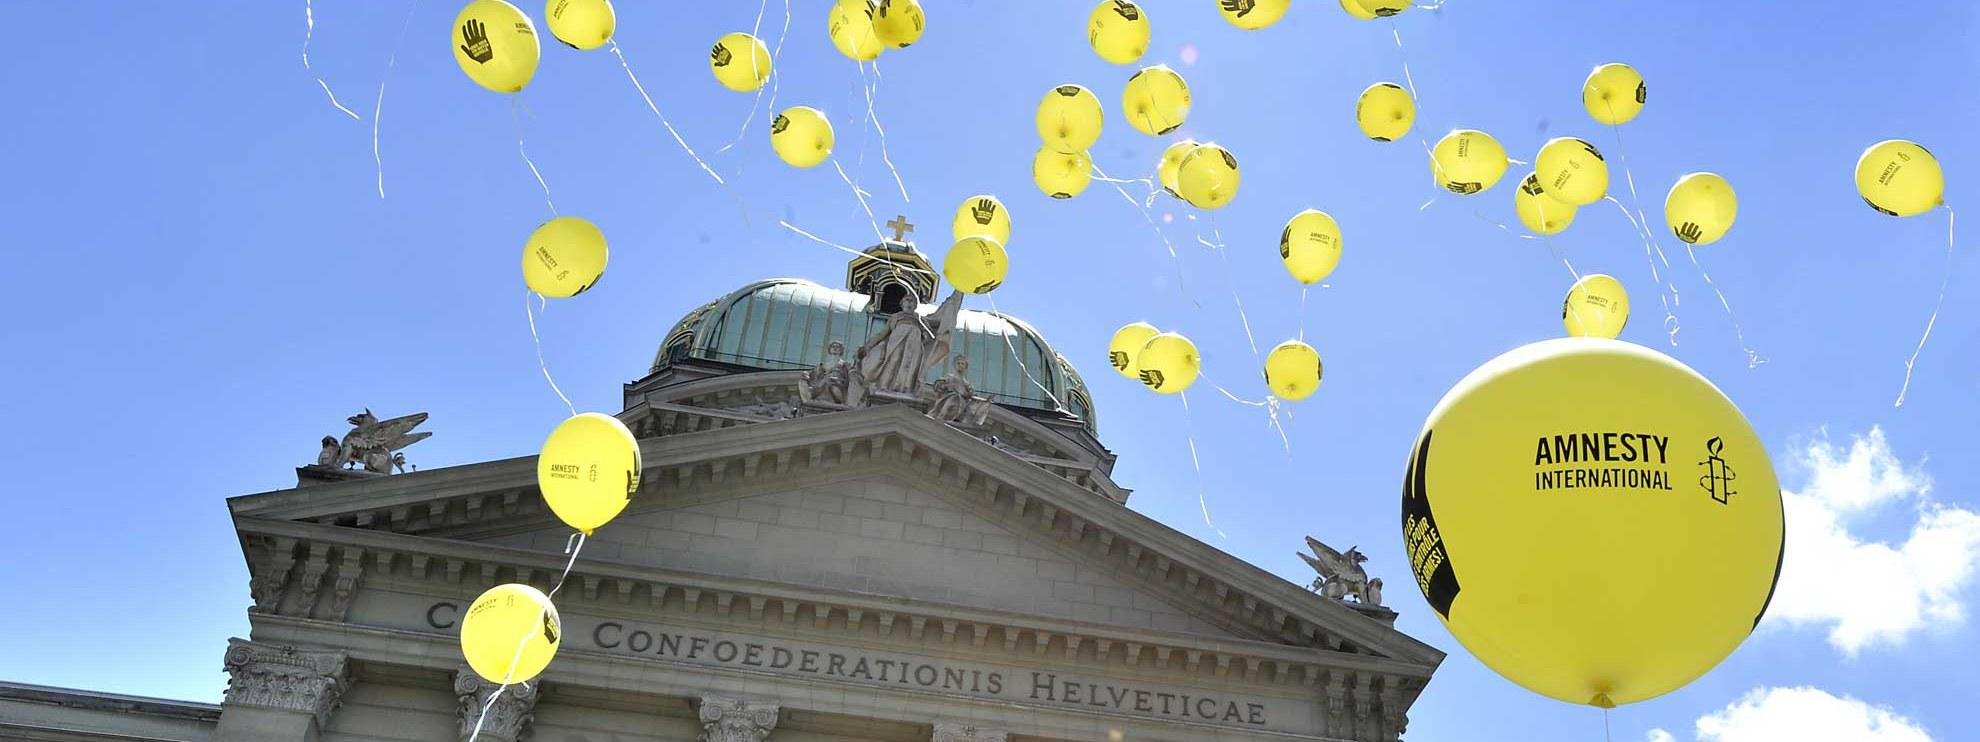 Amnesty-Aktion vor dem Bundeshaus in Bern. © Valérie Chételat